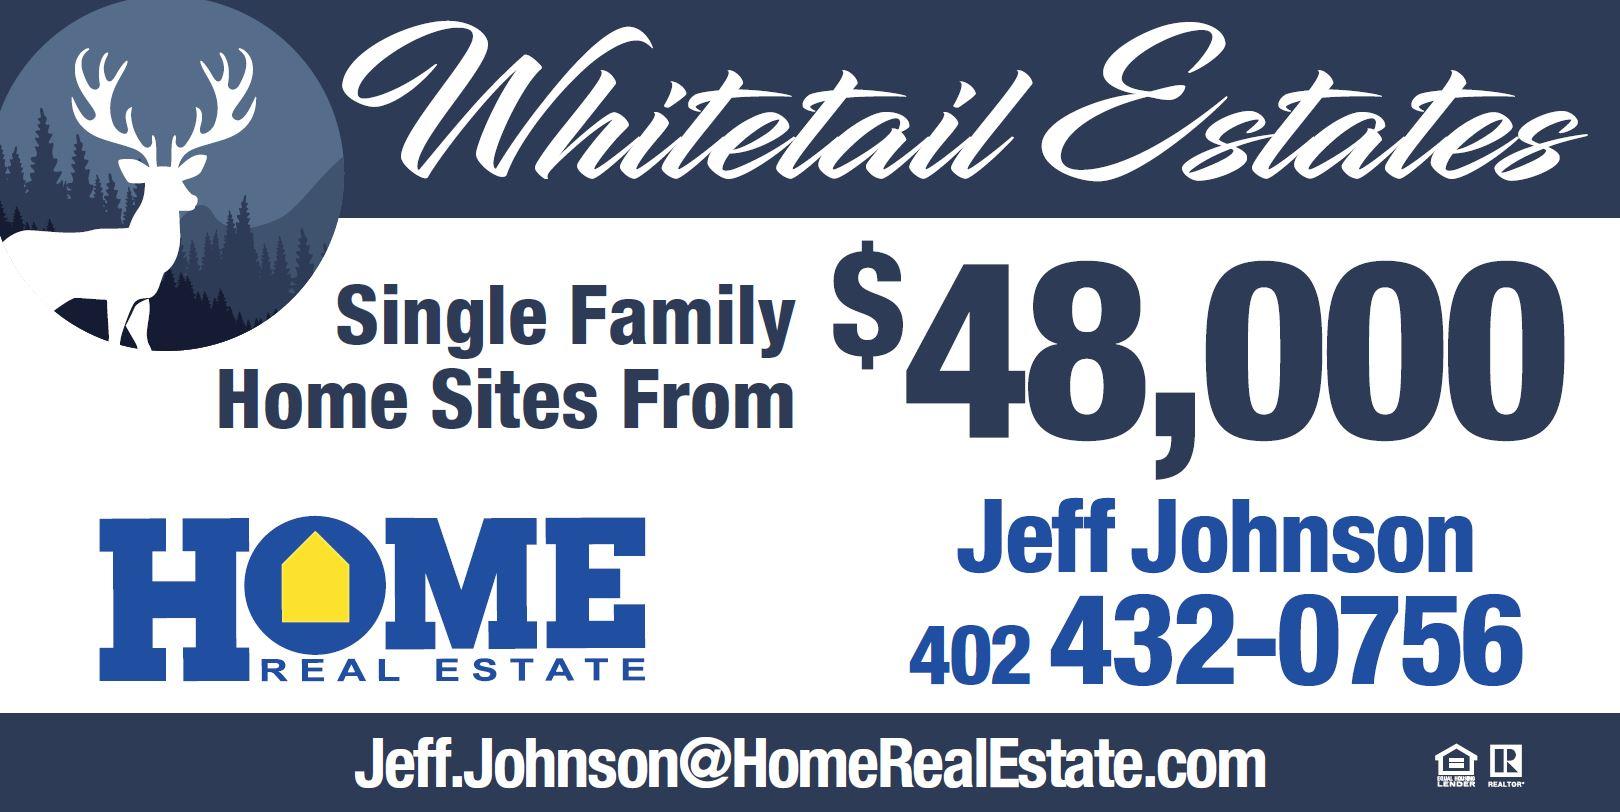 Whitetail Estates   Single Family Home Sites From $48,00